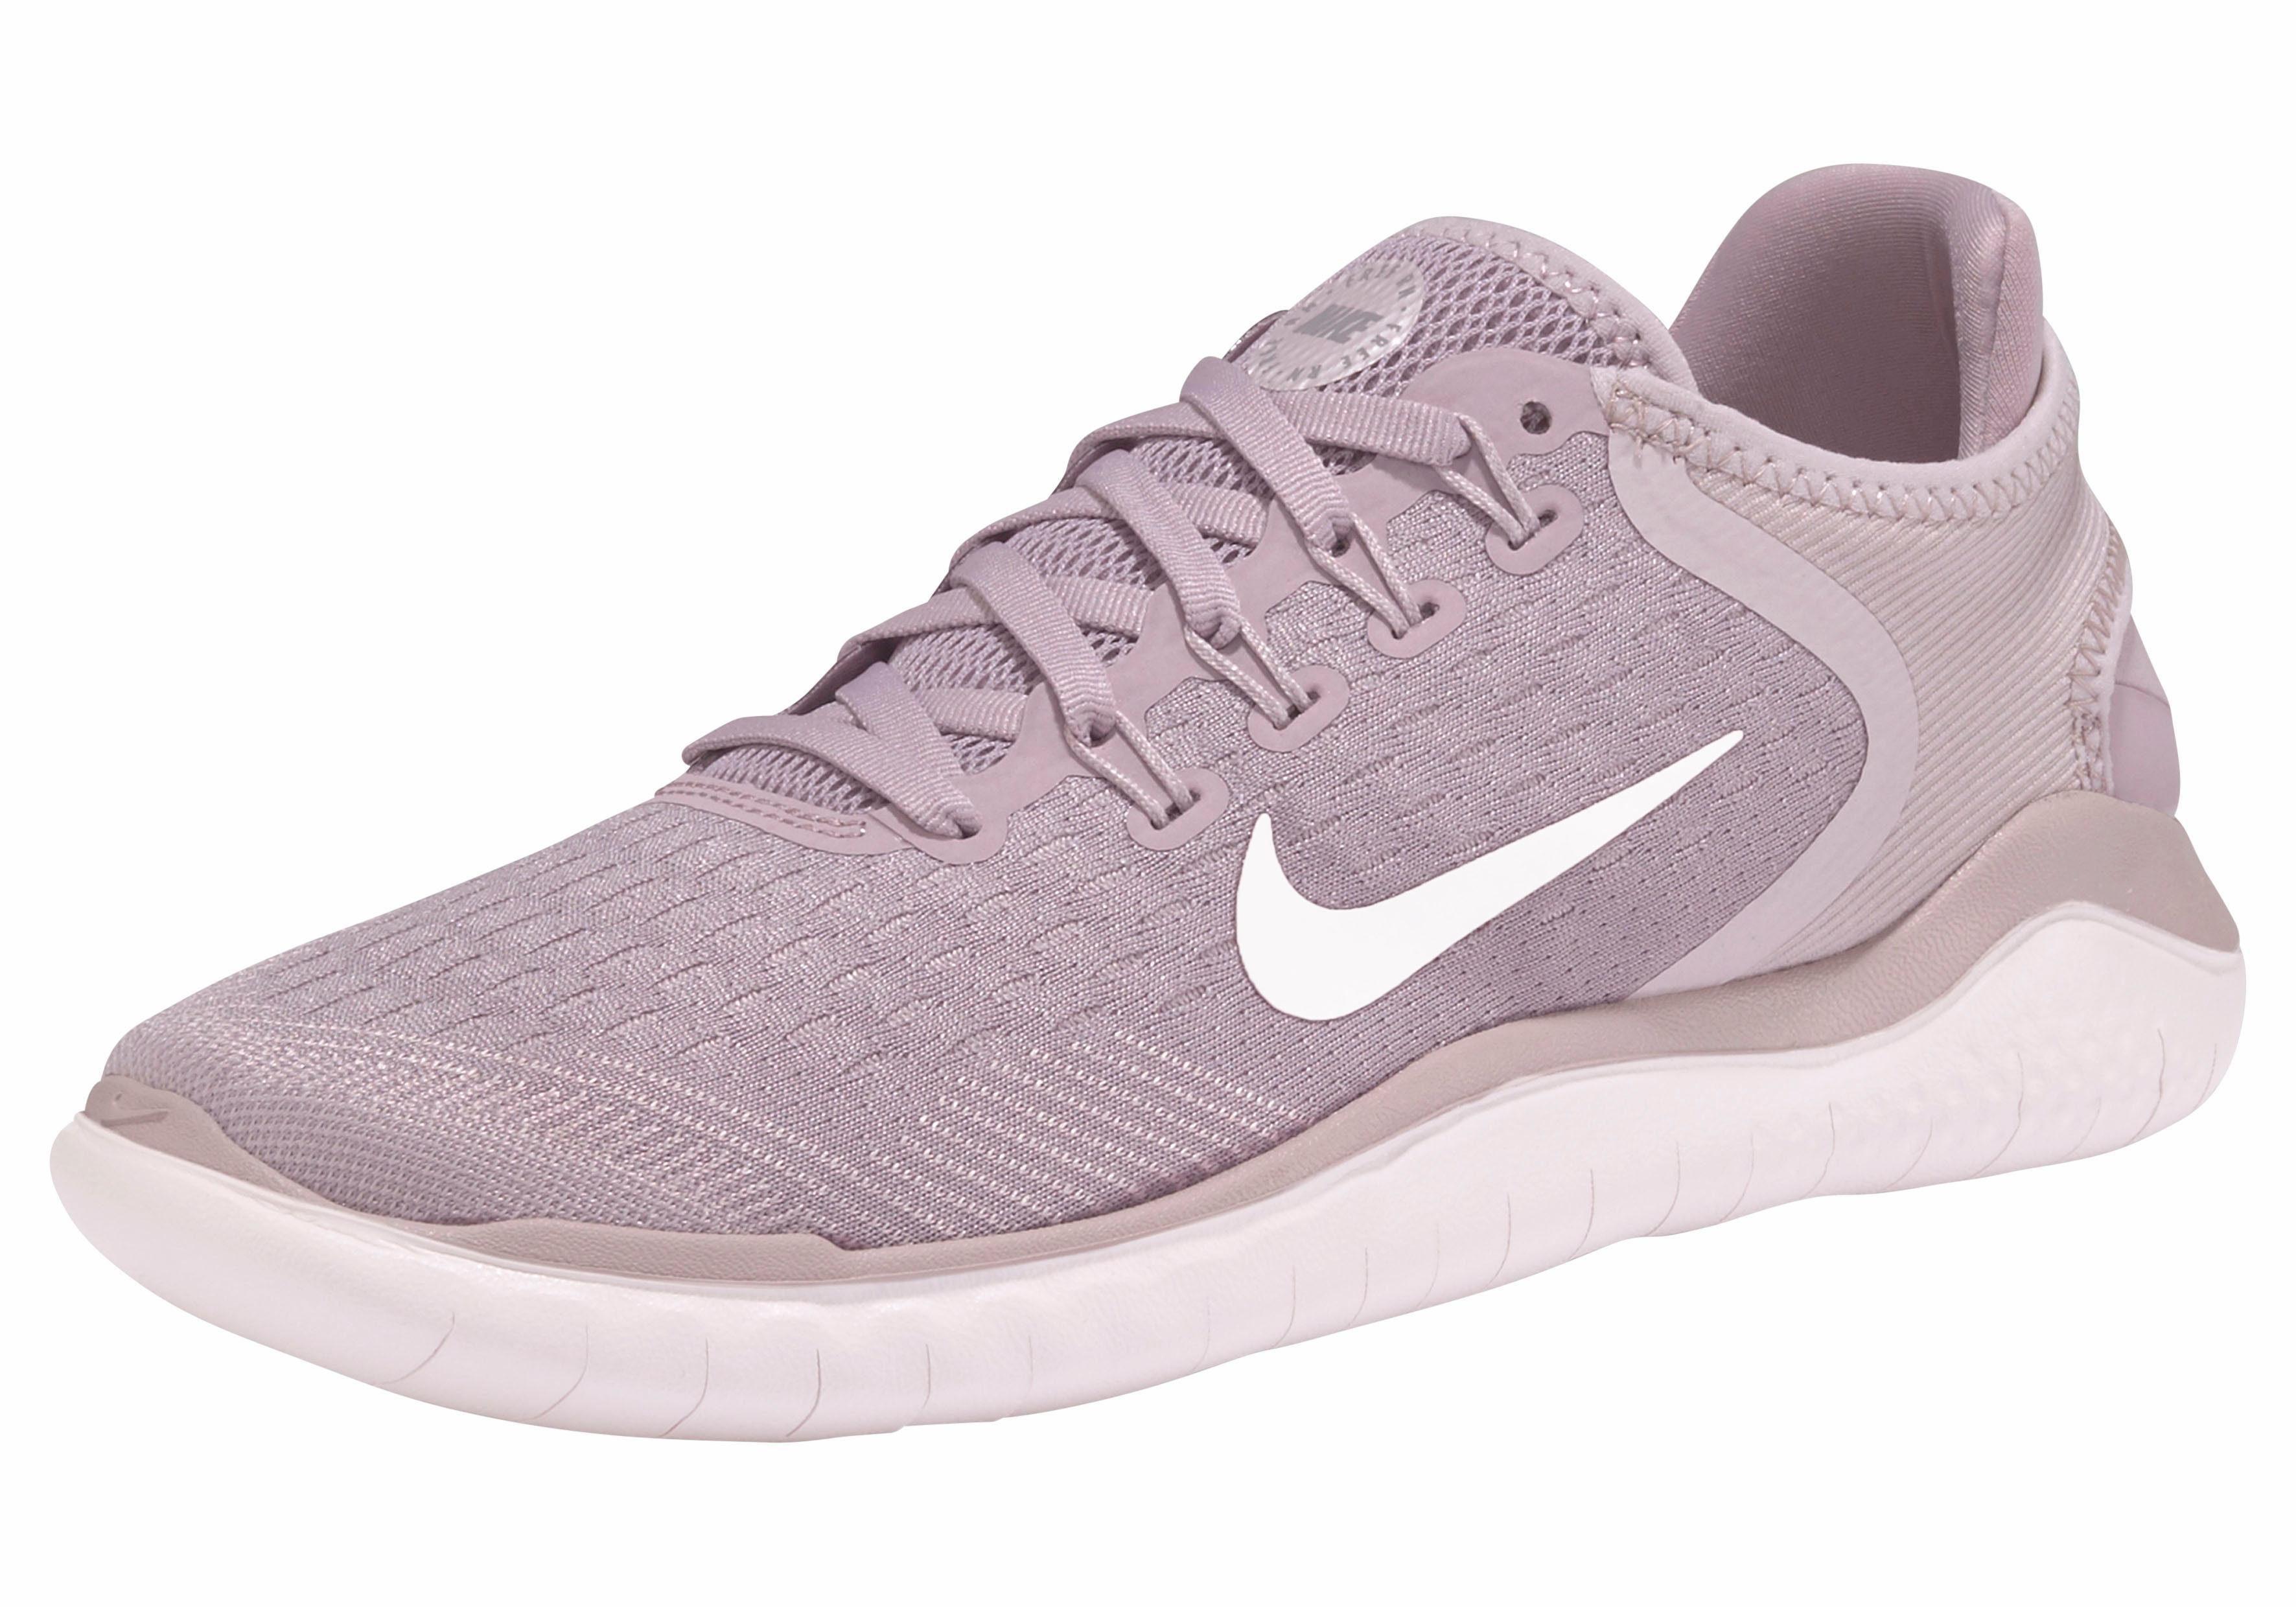 Nike Wmns Free Run 2018 Laufschuh online kaufen  helllila